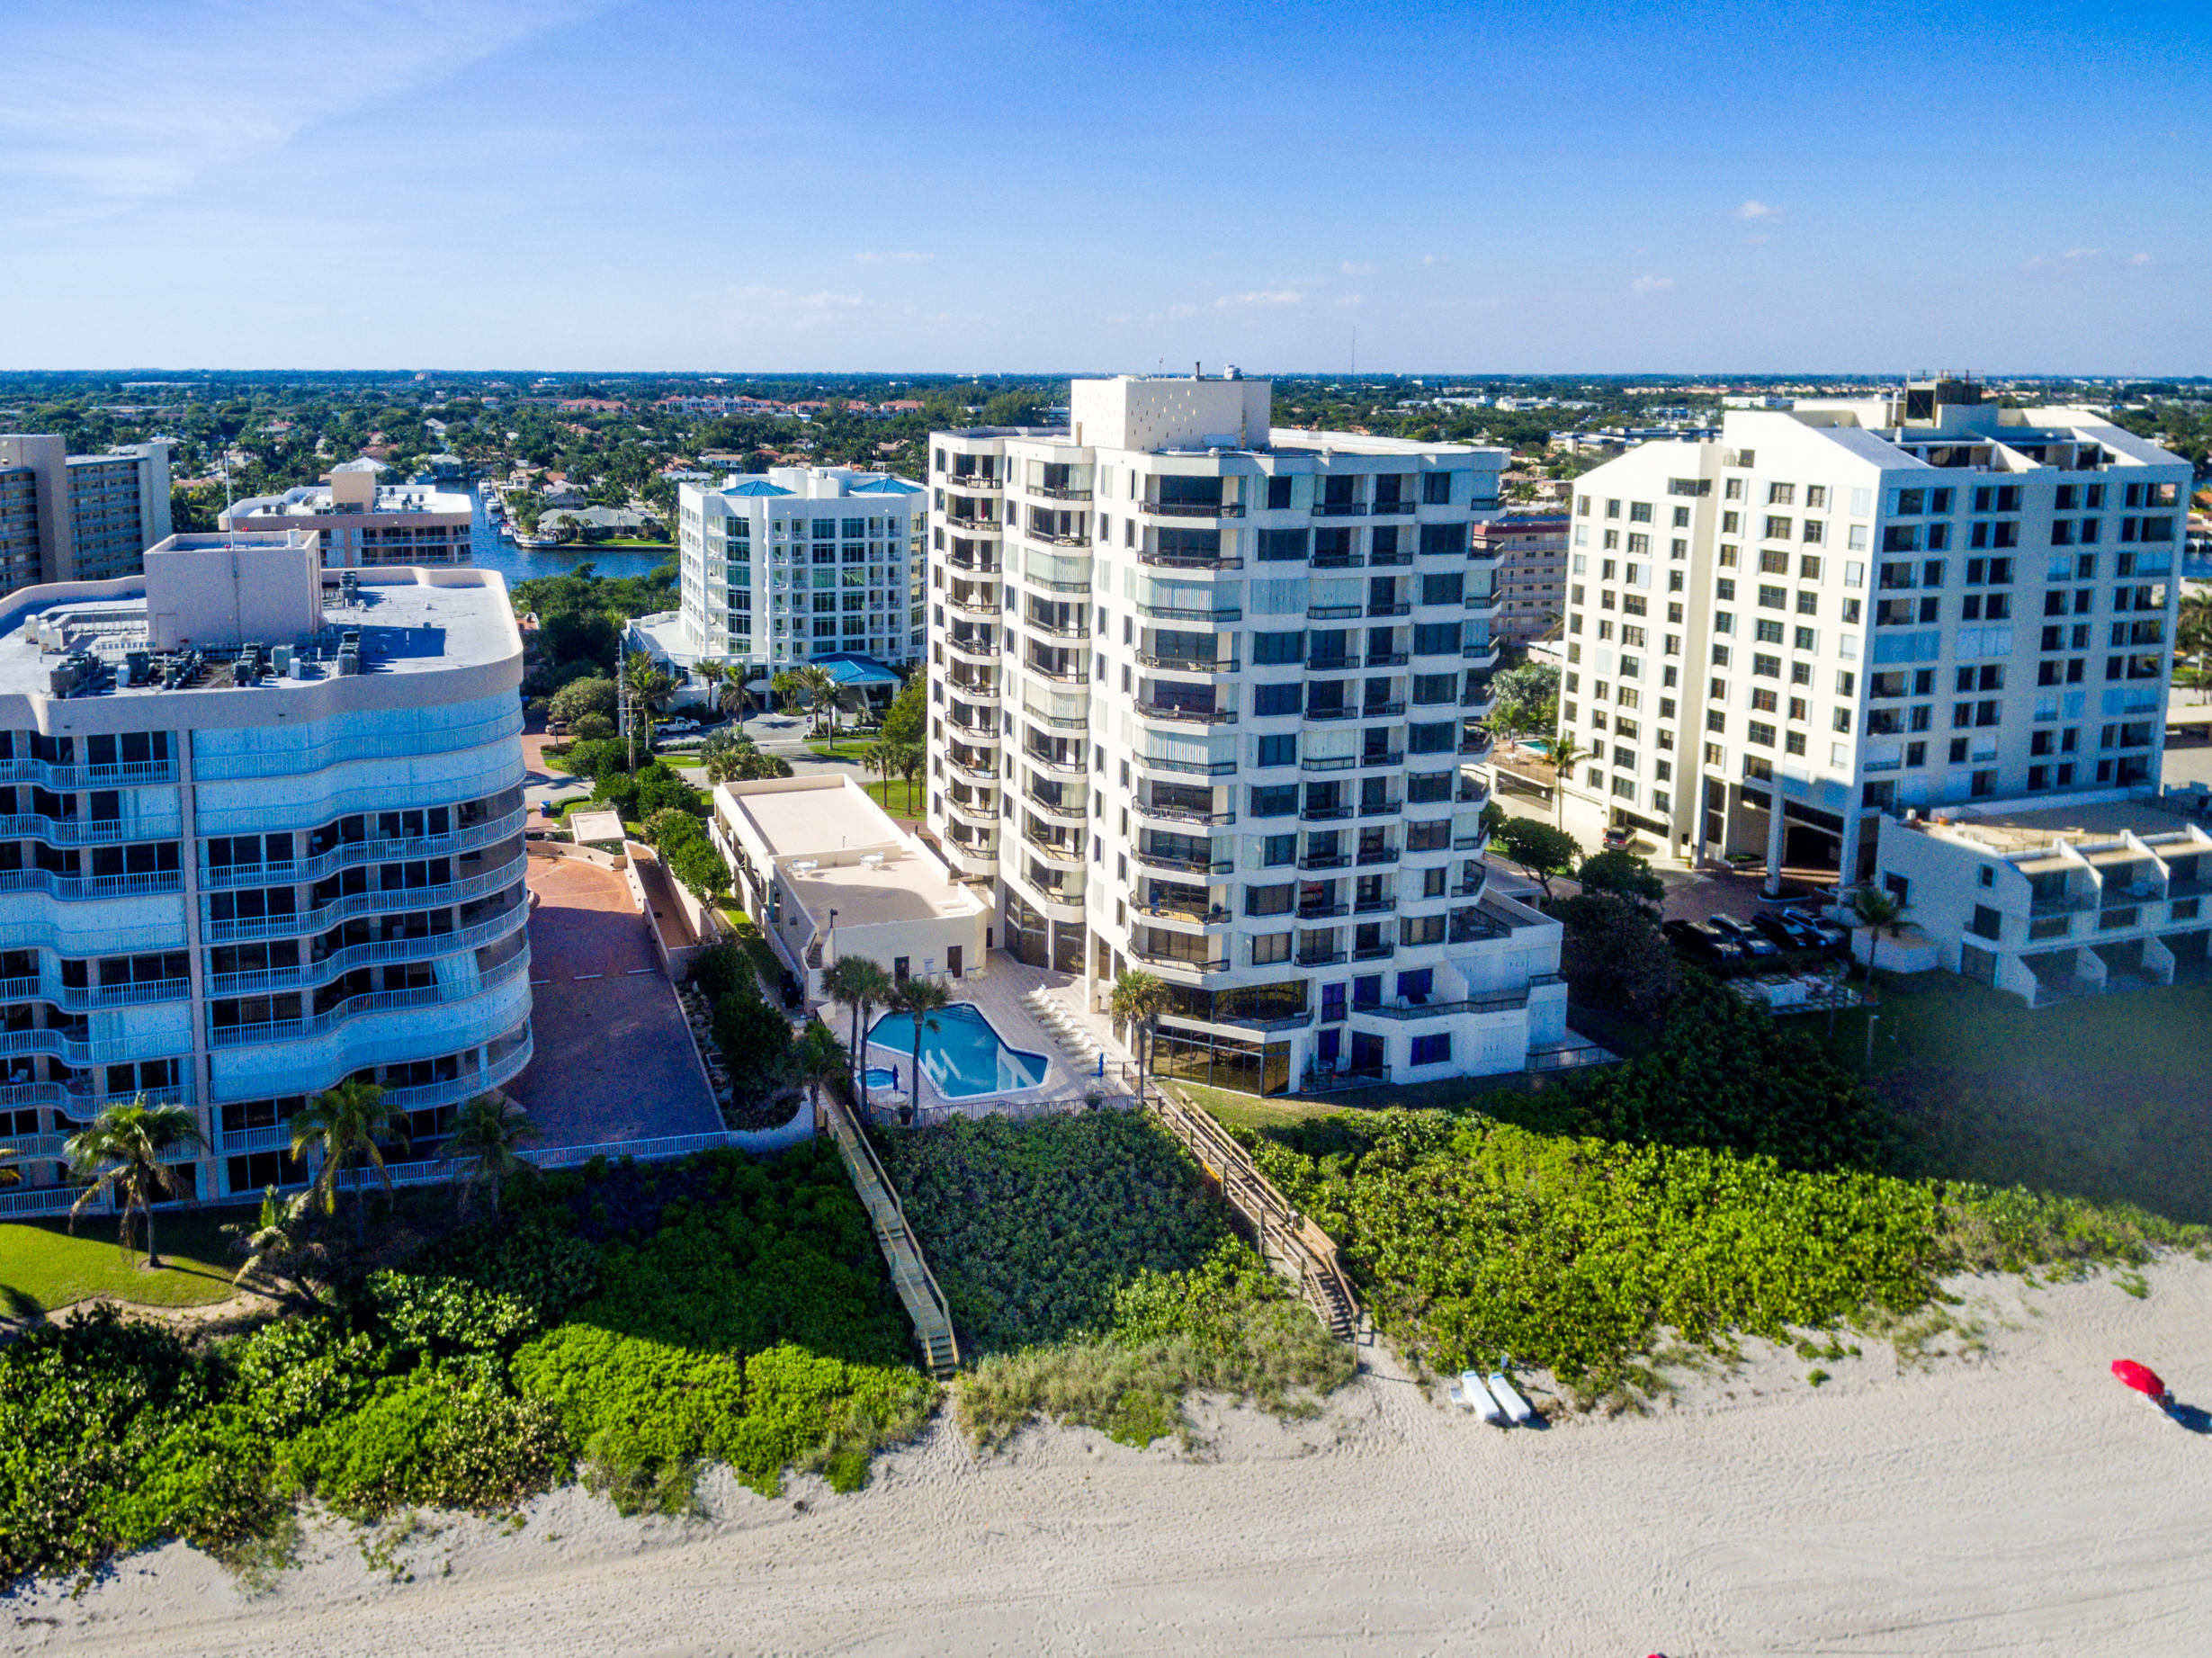 3201 Ocean Boulevard, Highland Beach, Florida 33487, 3 Bedrooms Bedrooms, ,2.1 BathroomsBathrooms,Condo/Coop,For Sale,Beach Walk East,Ocean,9,RX-10478861